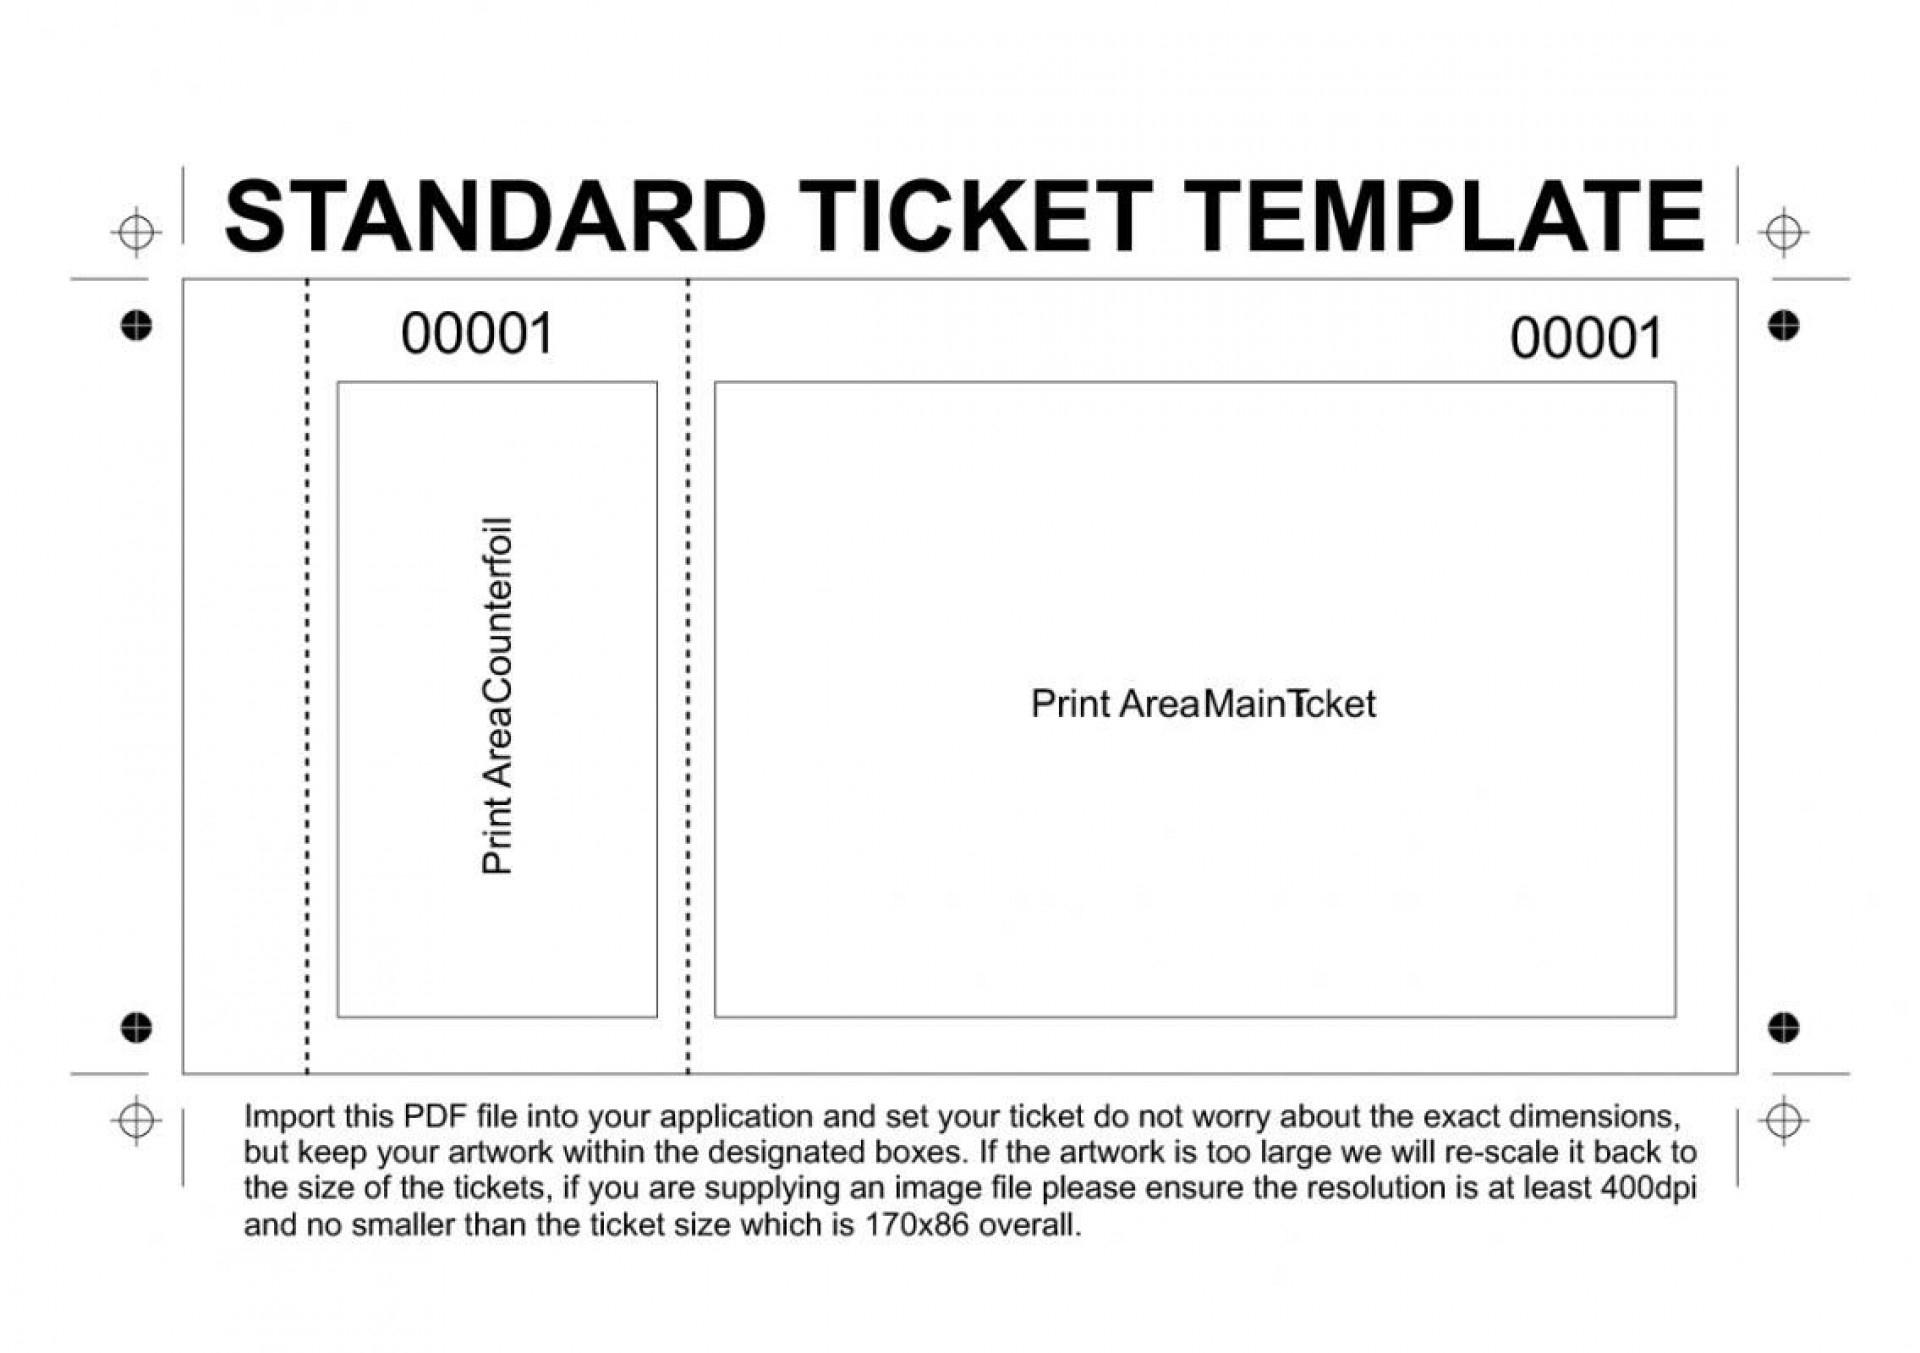 002 Template Ideas Print Tickets Free Stupendous How To Create A - Create Tickets Free Printable